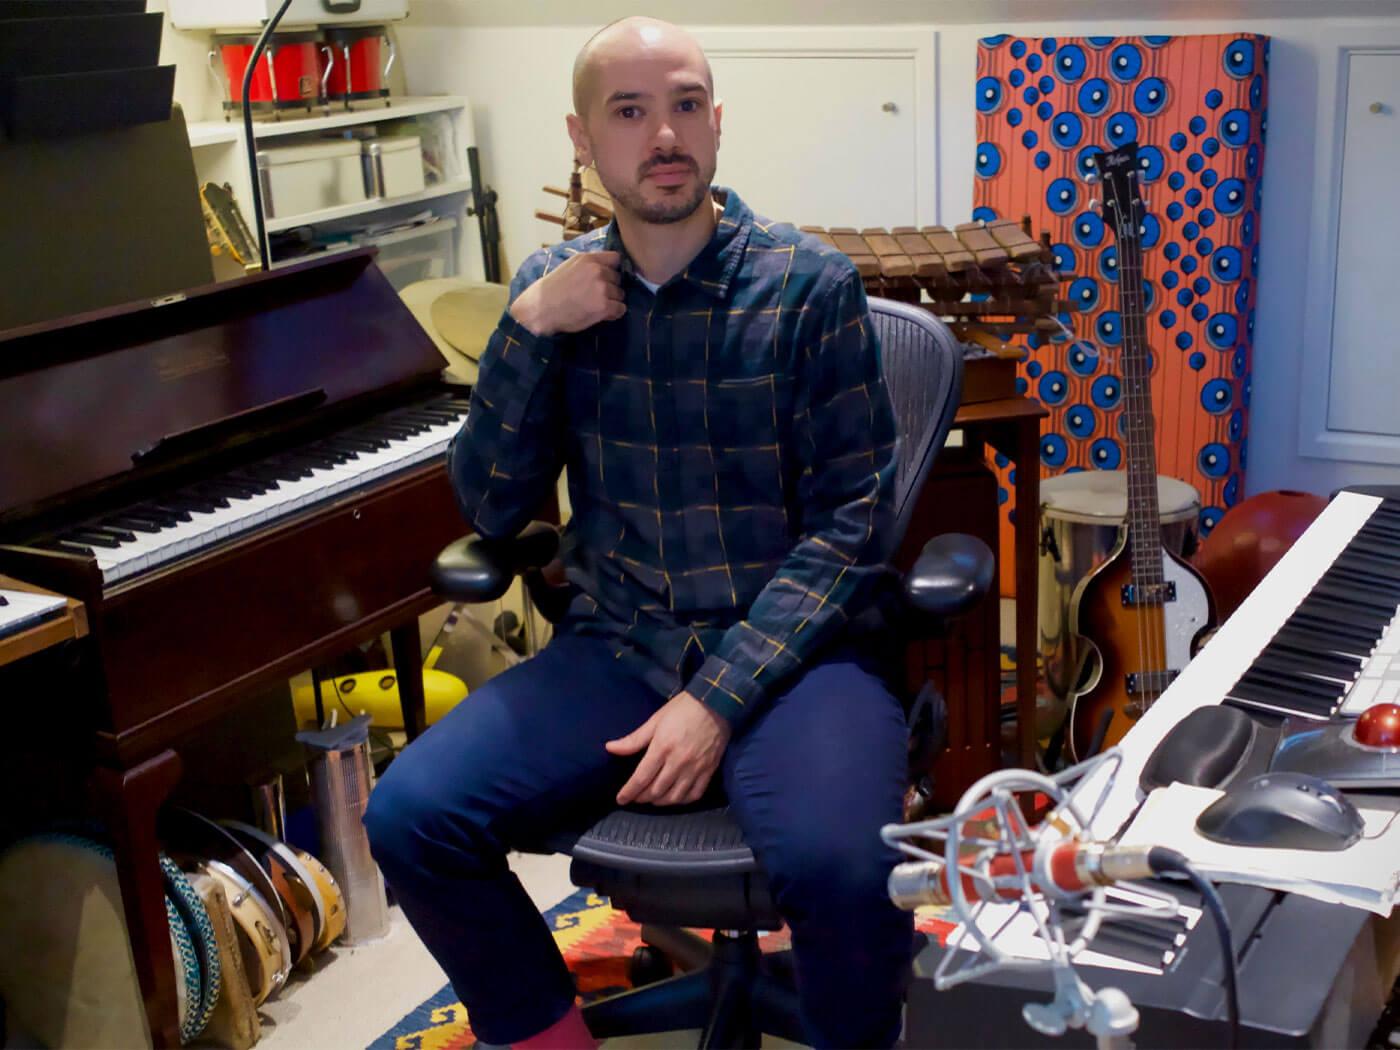 Tim Goalen in the studio